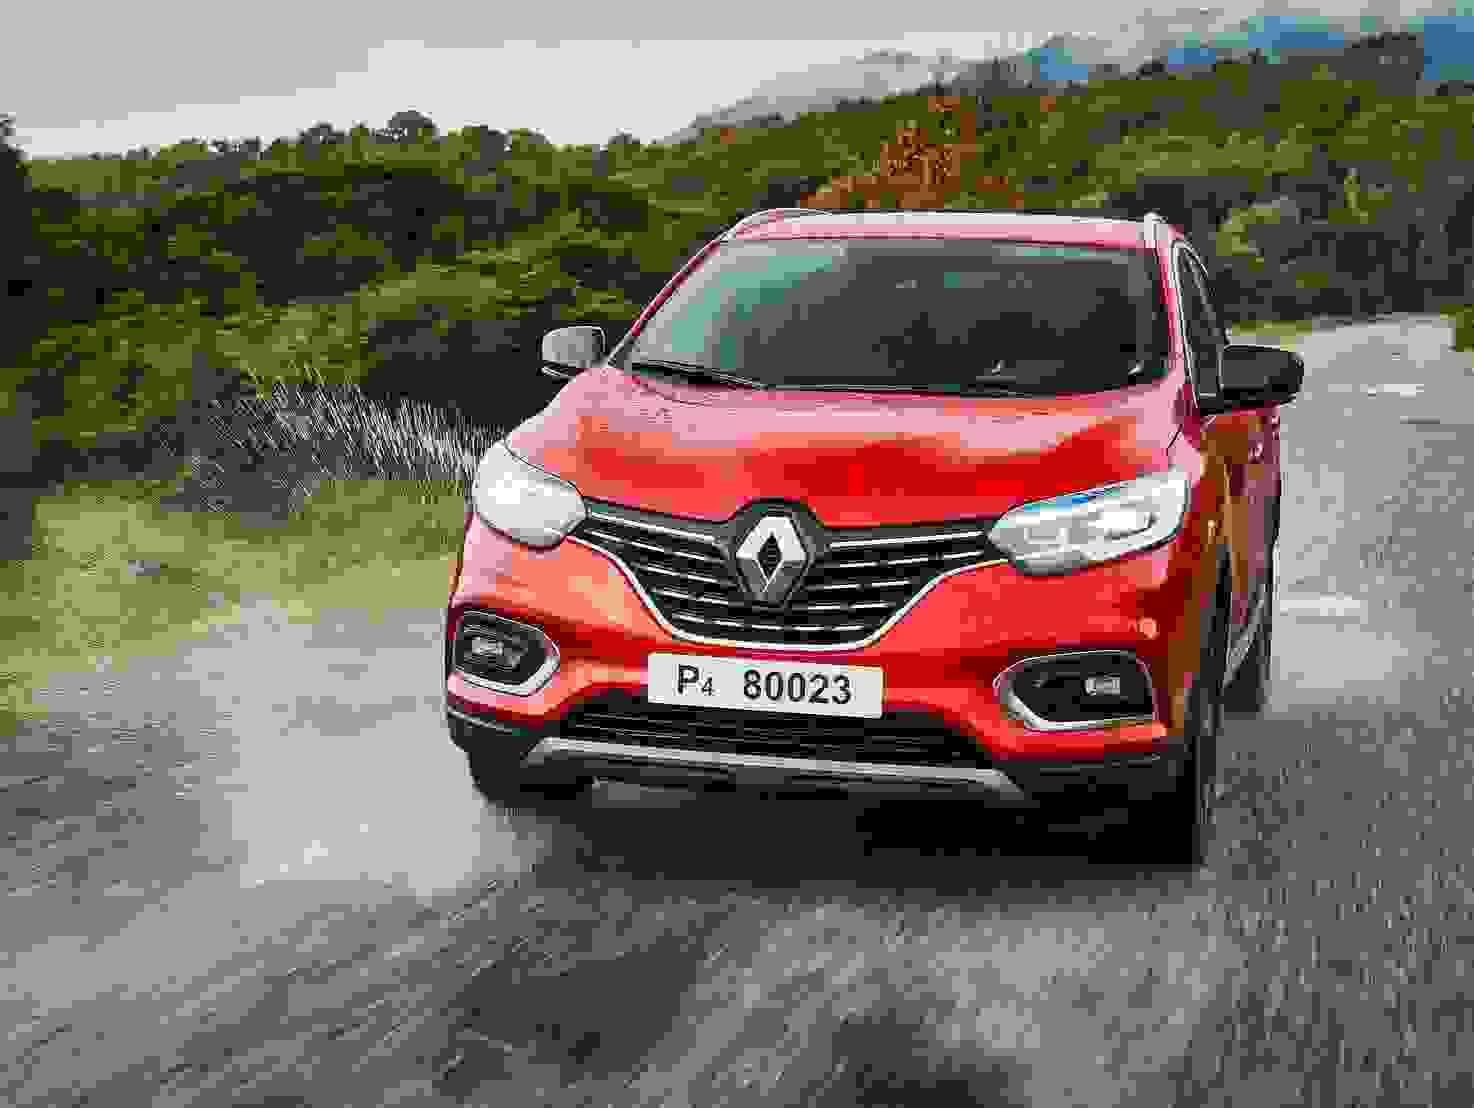 Renault Kadjar 2018 Eksterior Roed Suv Fleksibel Offroad Firhjulstraek